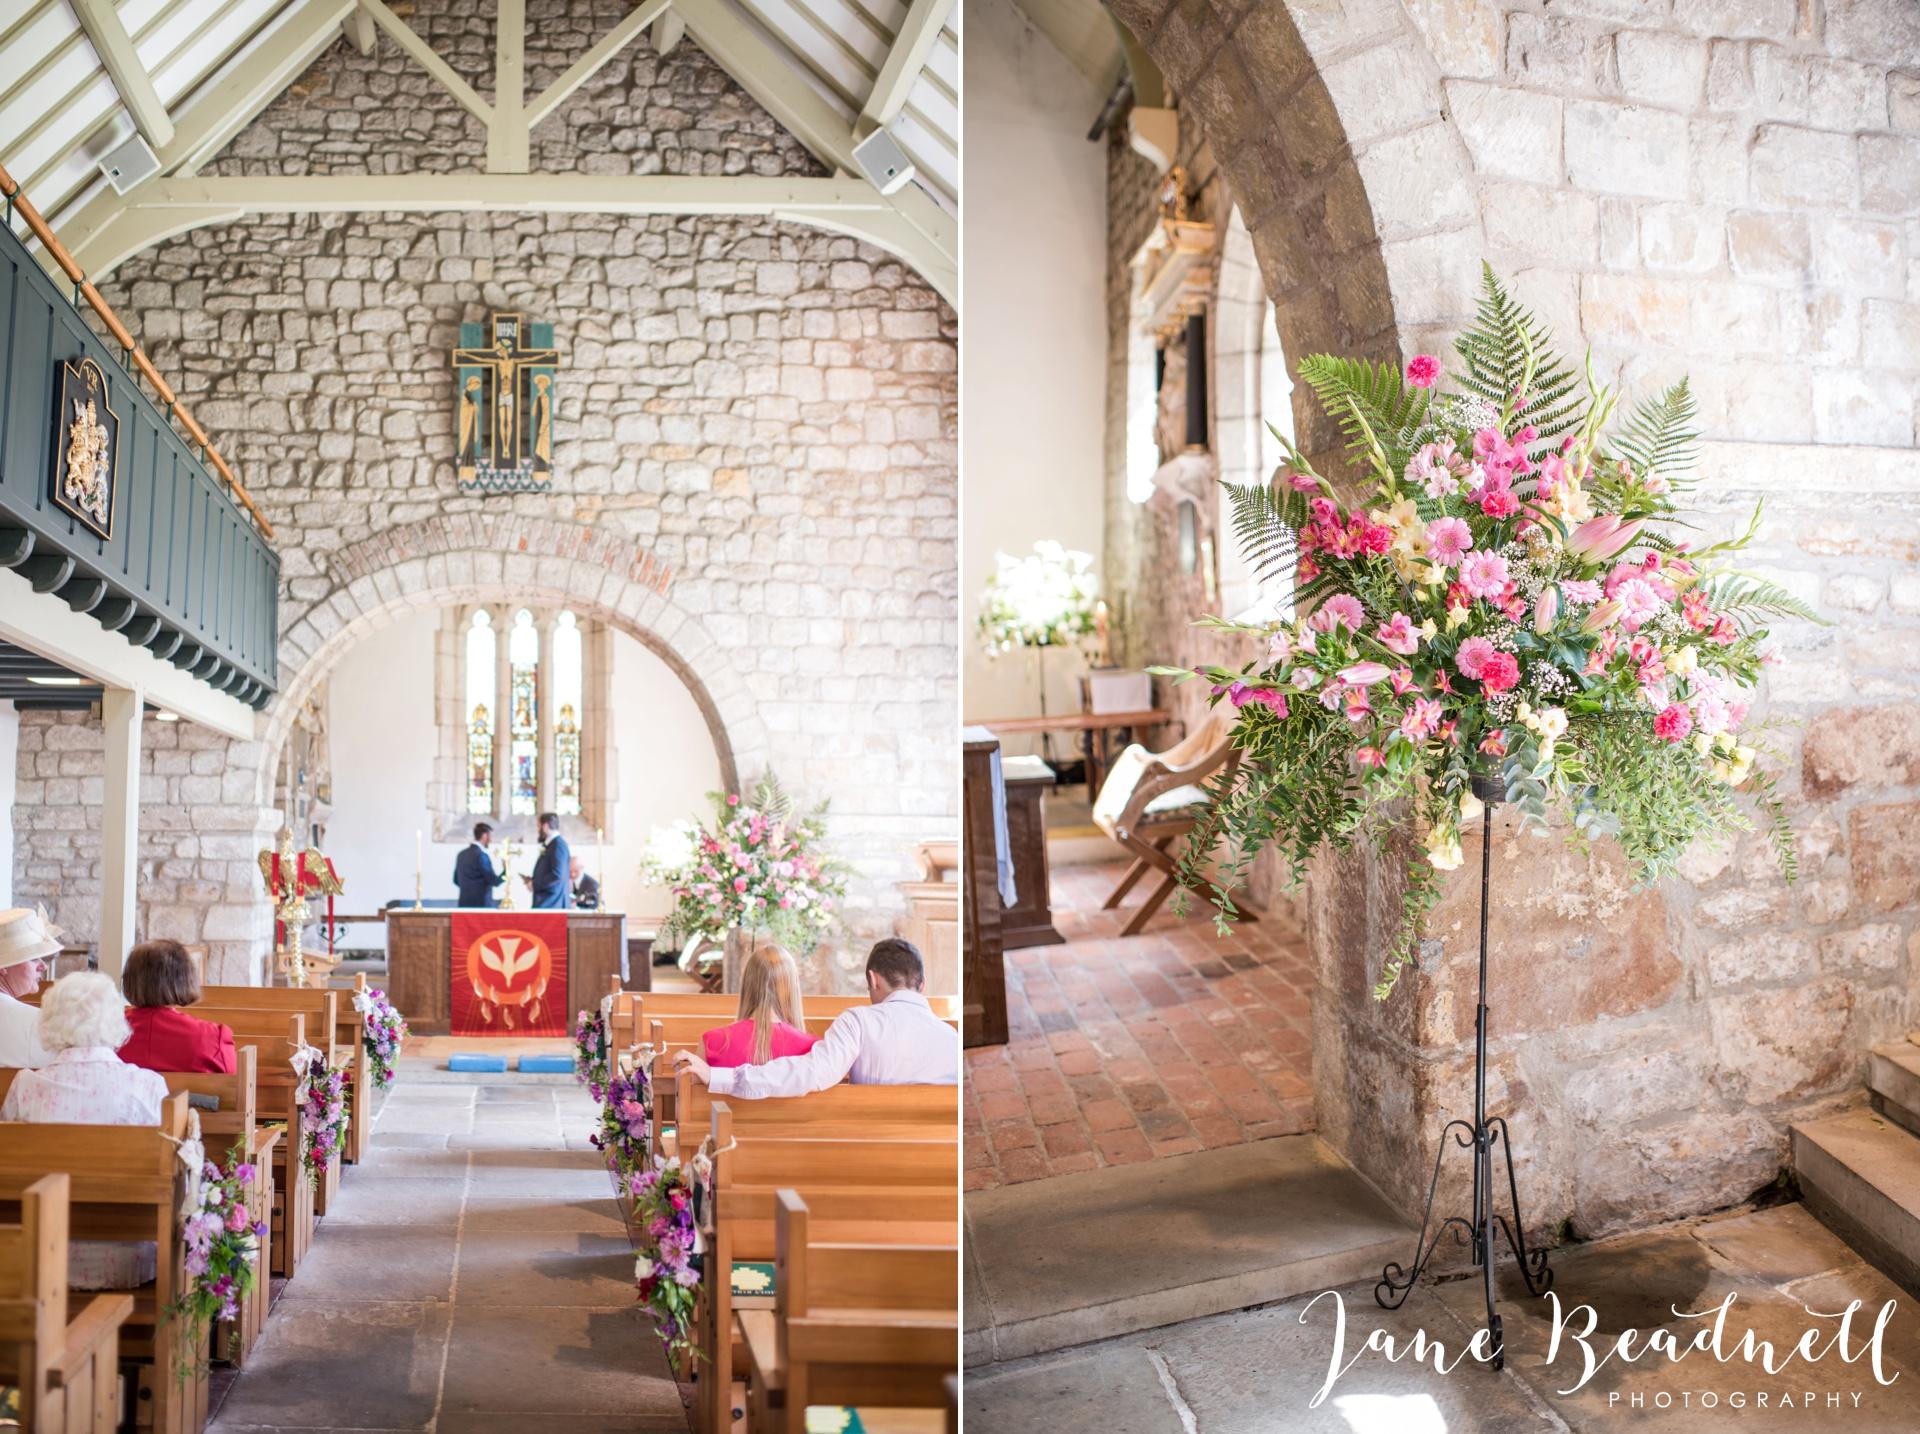 yorkshire-fine-art-wedding-photographer-jane-beadnell-photography-poppleton-york_0024